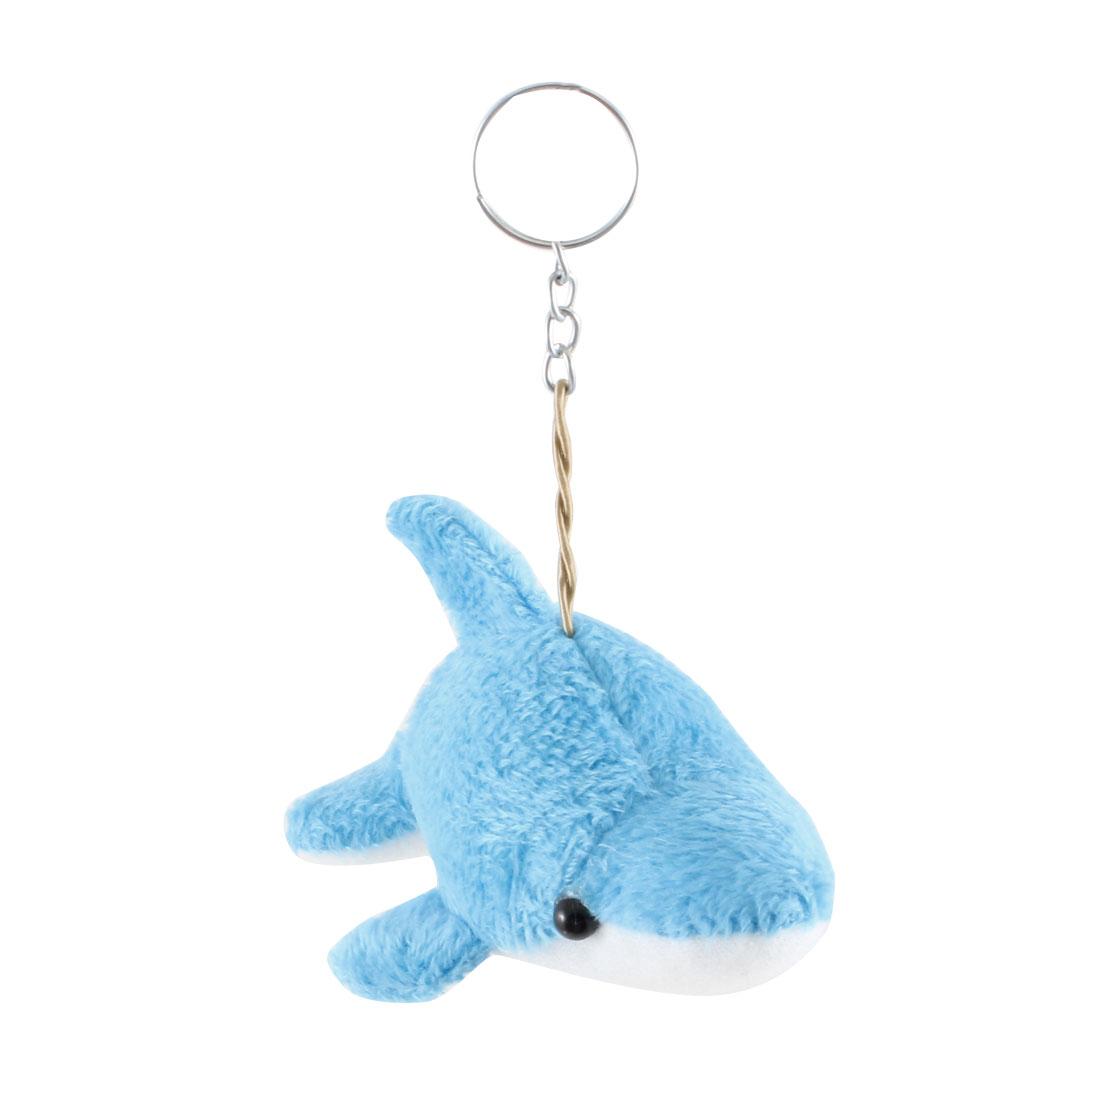 Blue White Cutton Blend Dolphin Keyring Pendant for Wallet Handbag